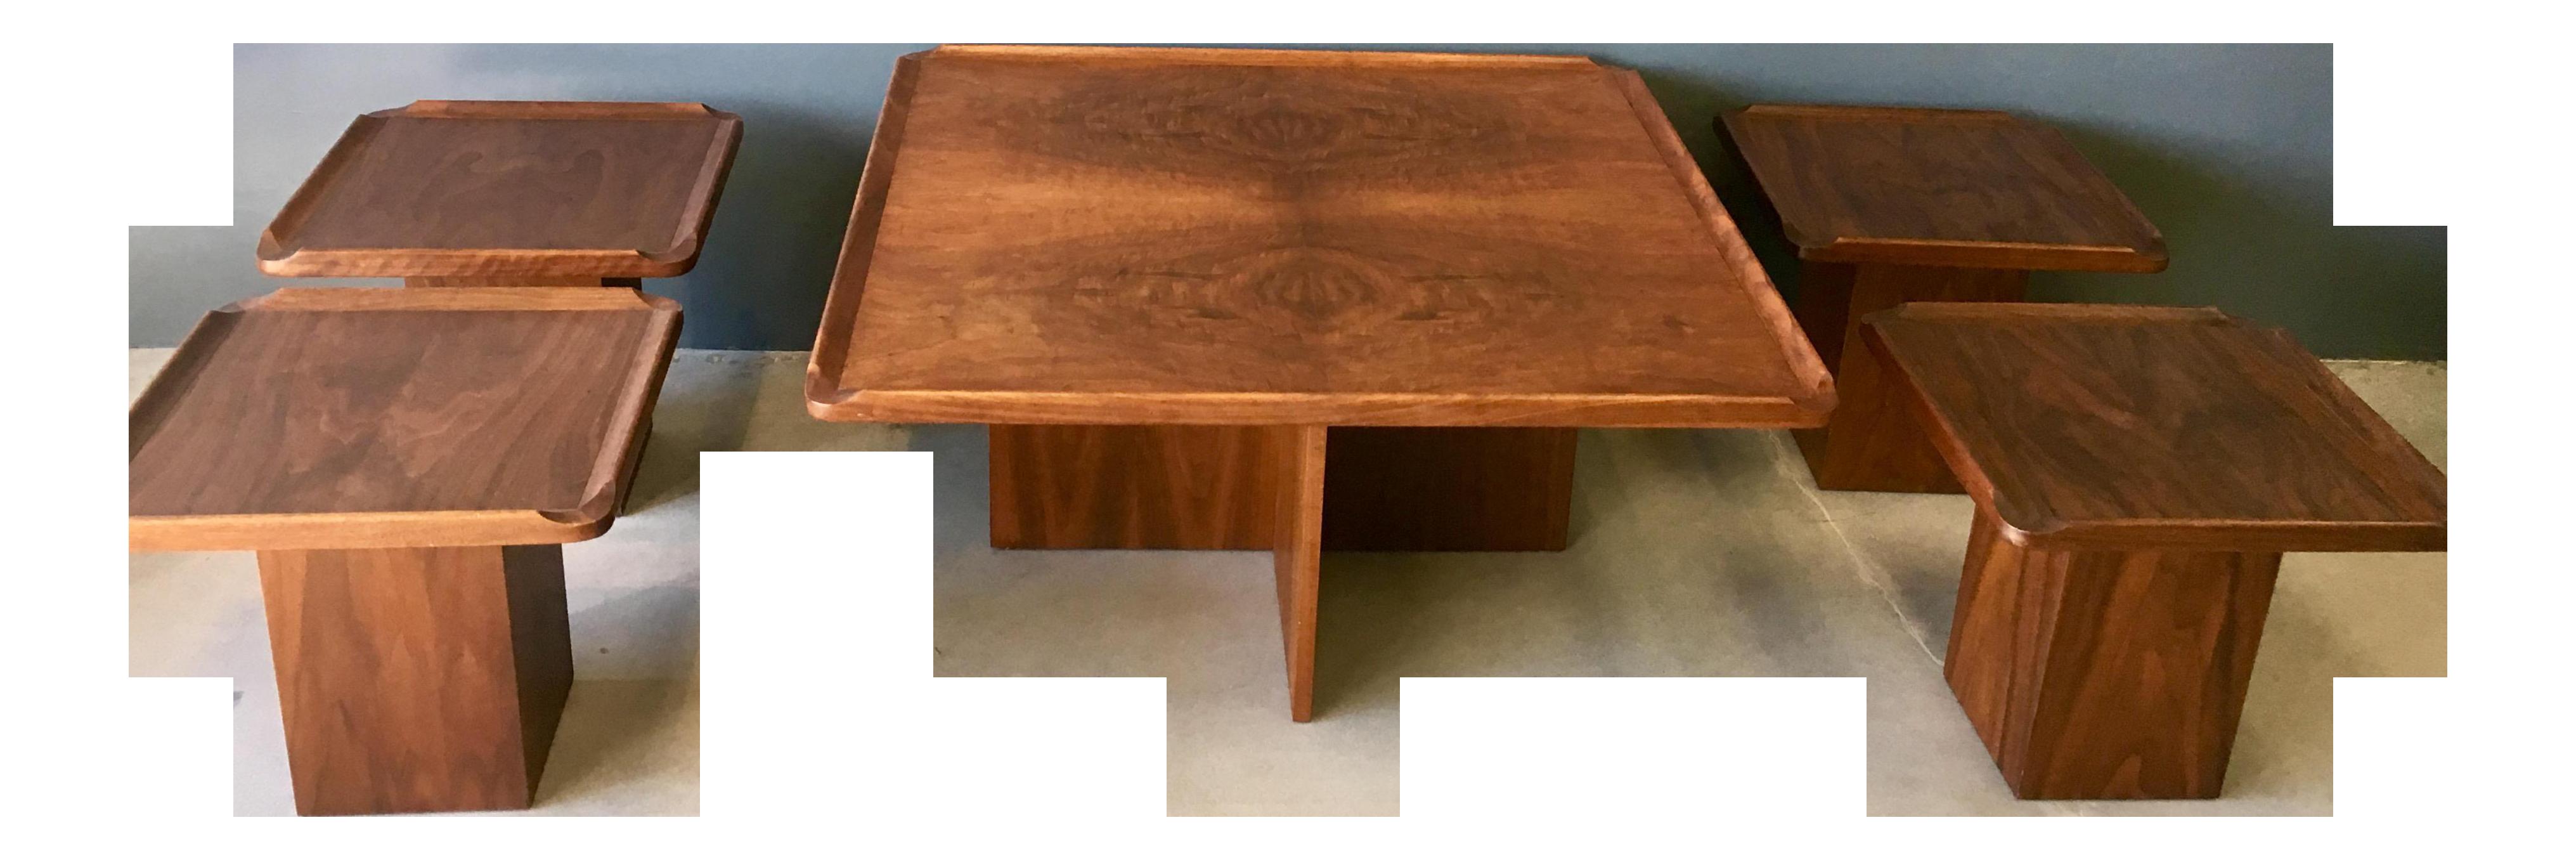 Gentil Brown Saltman Mid Century Coffee U0026 Nesting Tables   5 Pieces